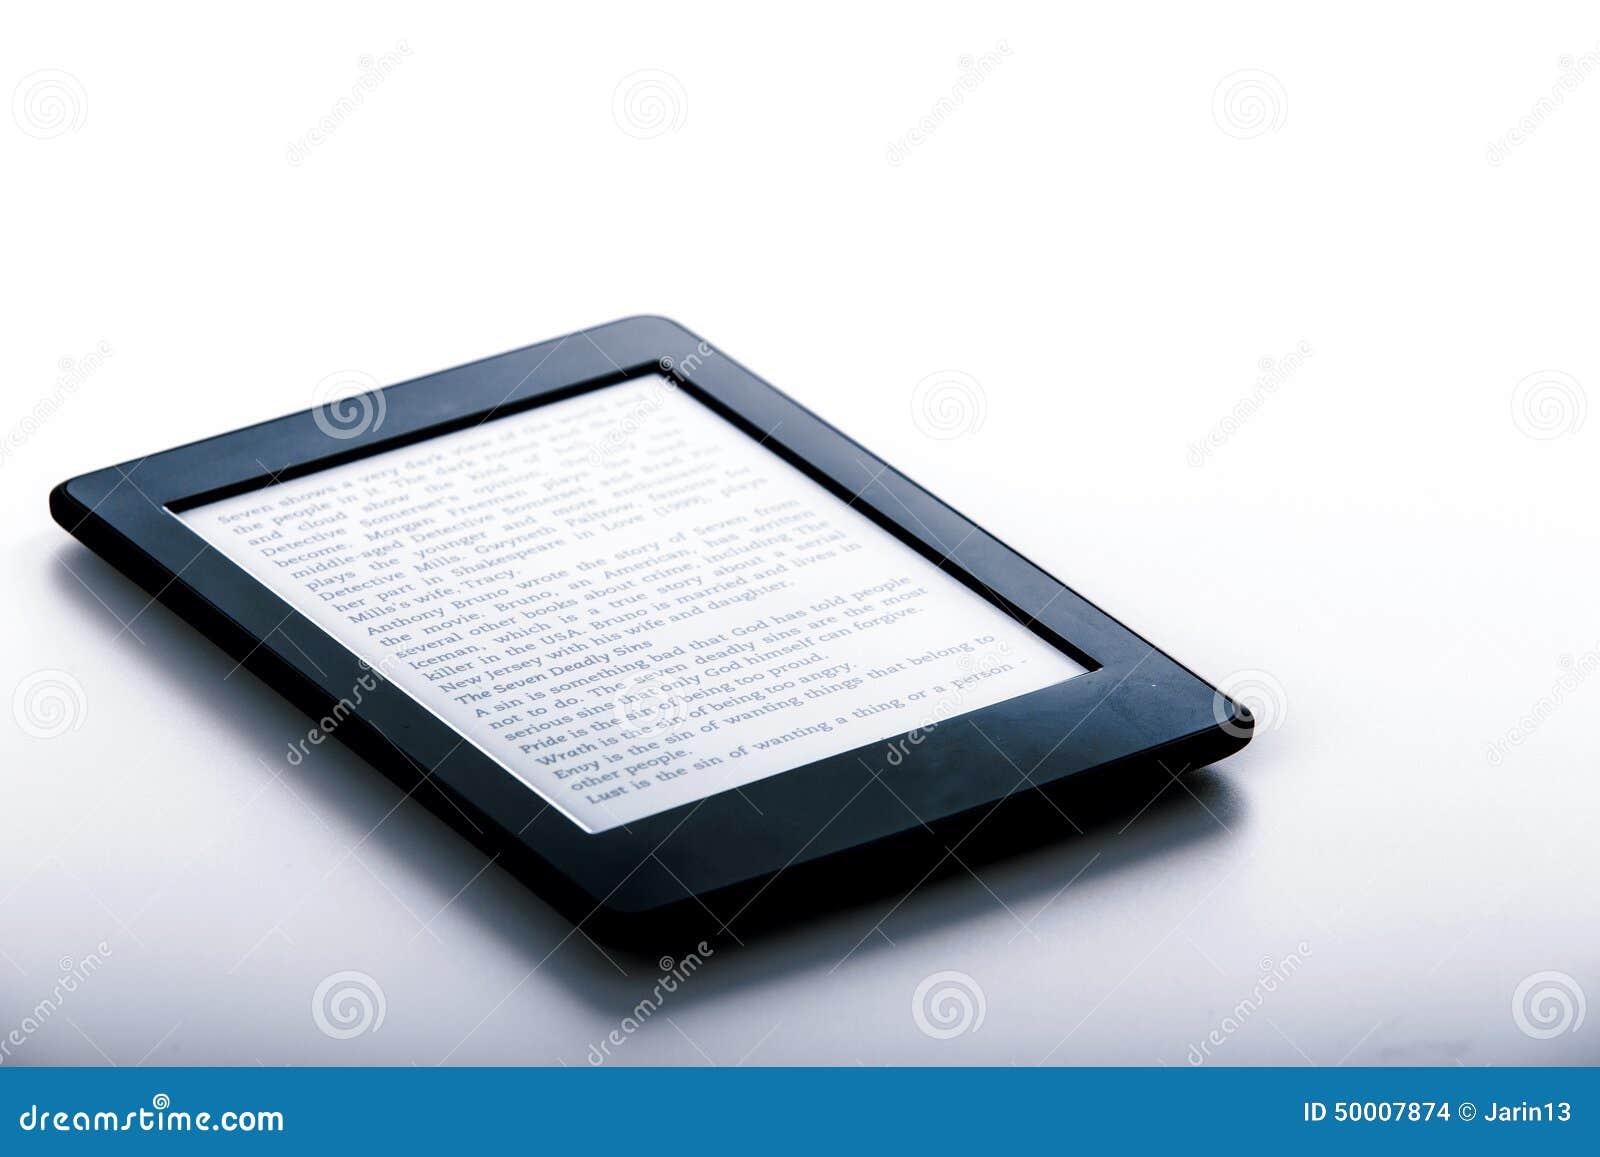 Black Ebook Reader Or Tablet On White Background Stock Photo - Image